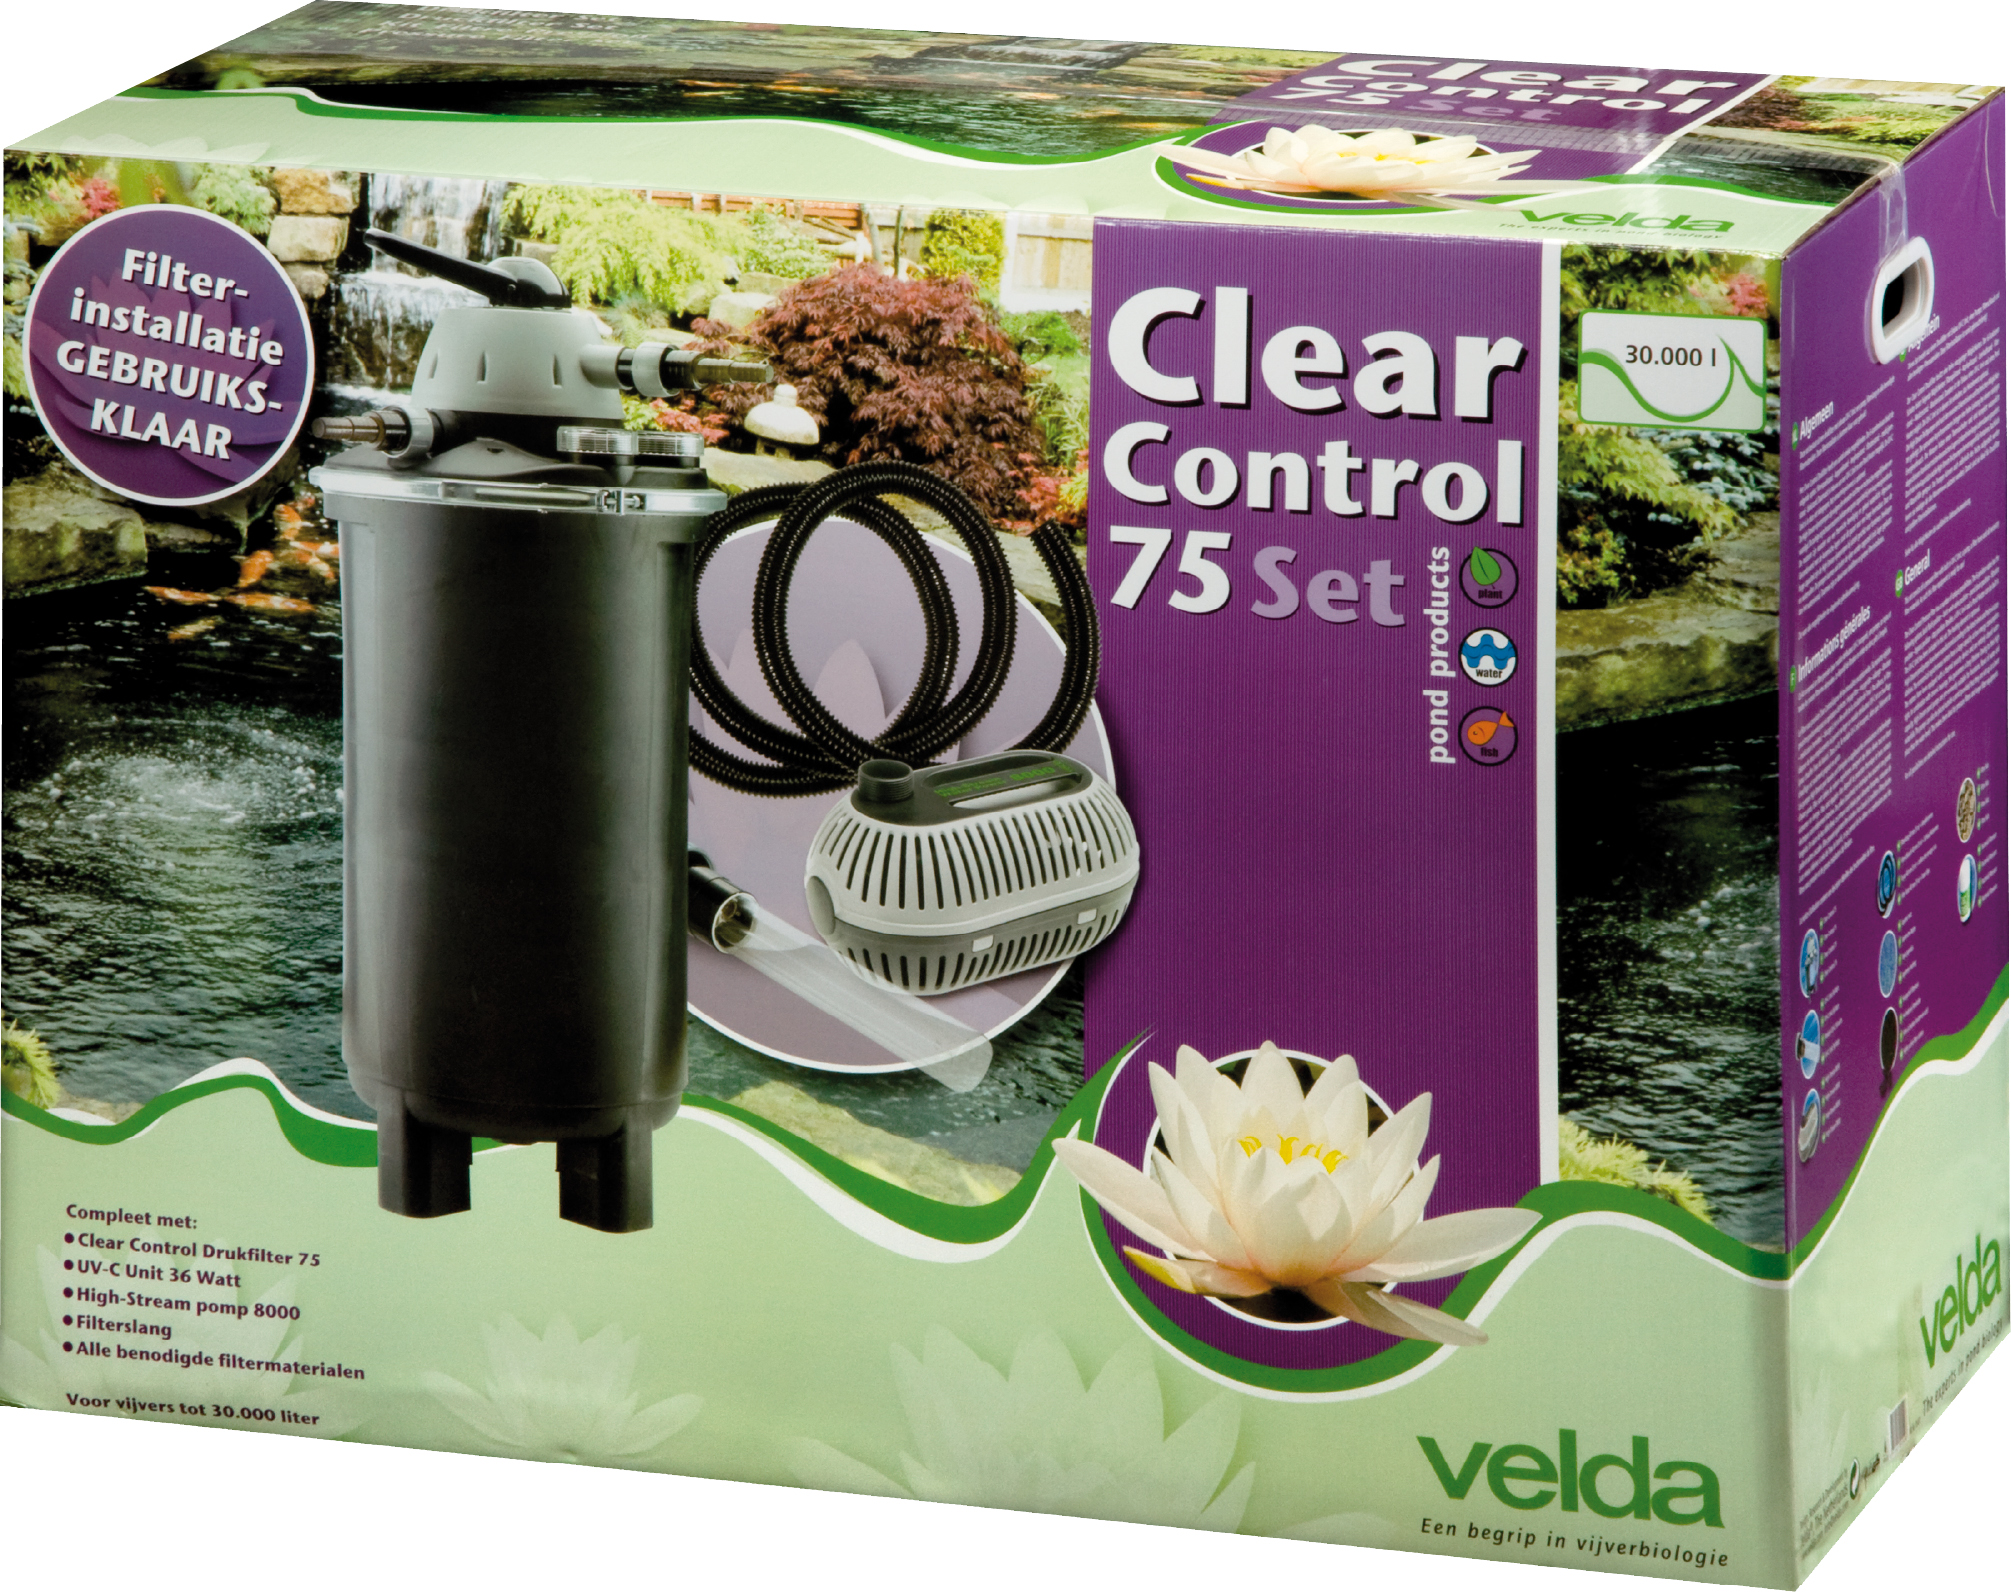 VELDA CLEAR CONTROL 75 DRUKFILTER SET